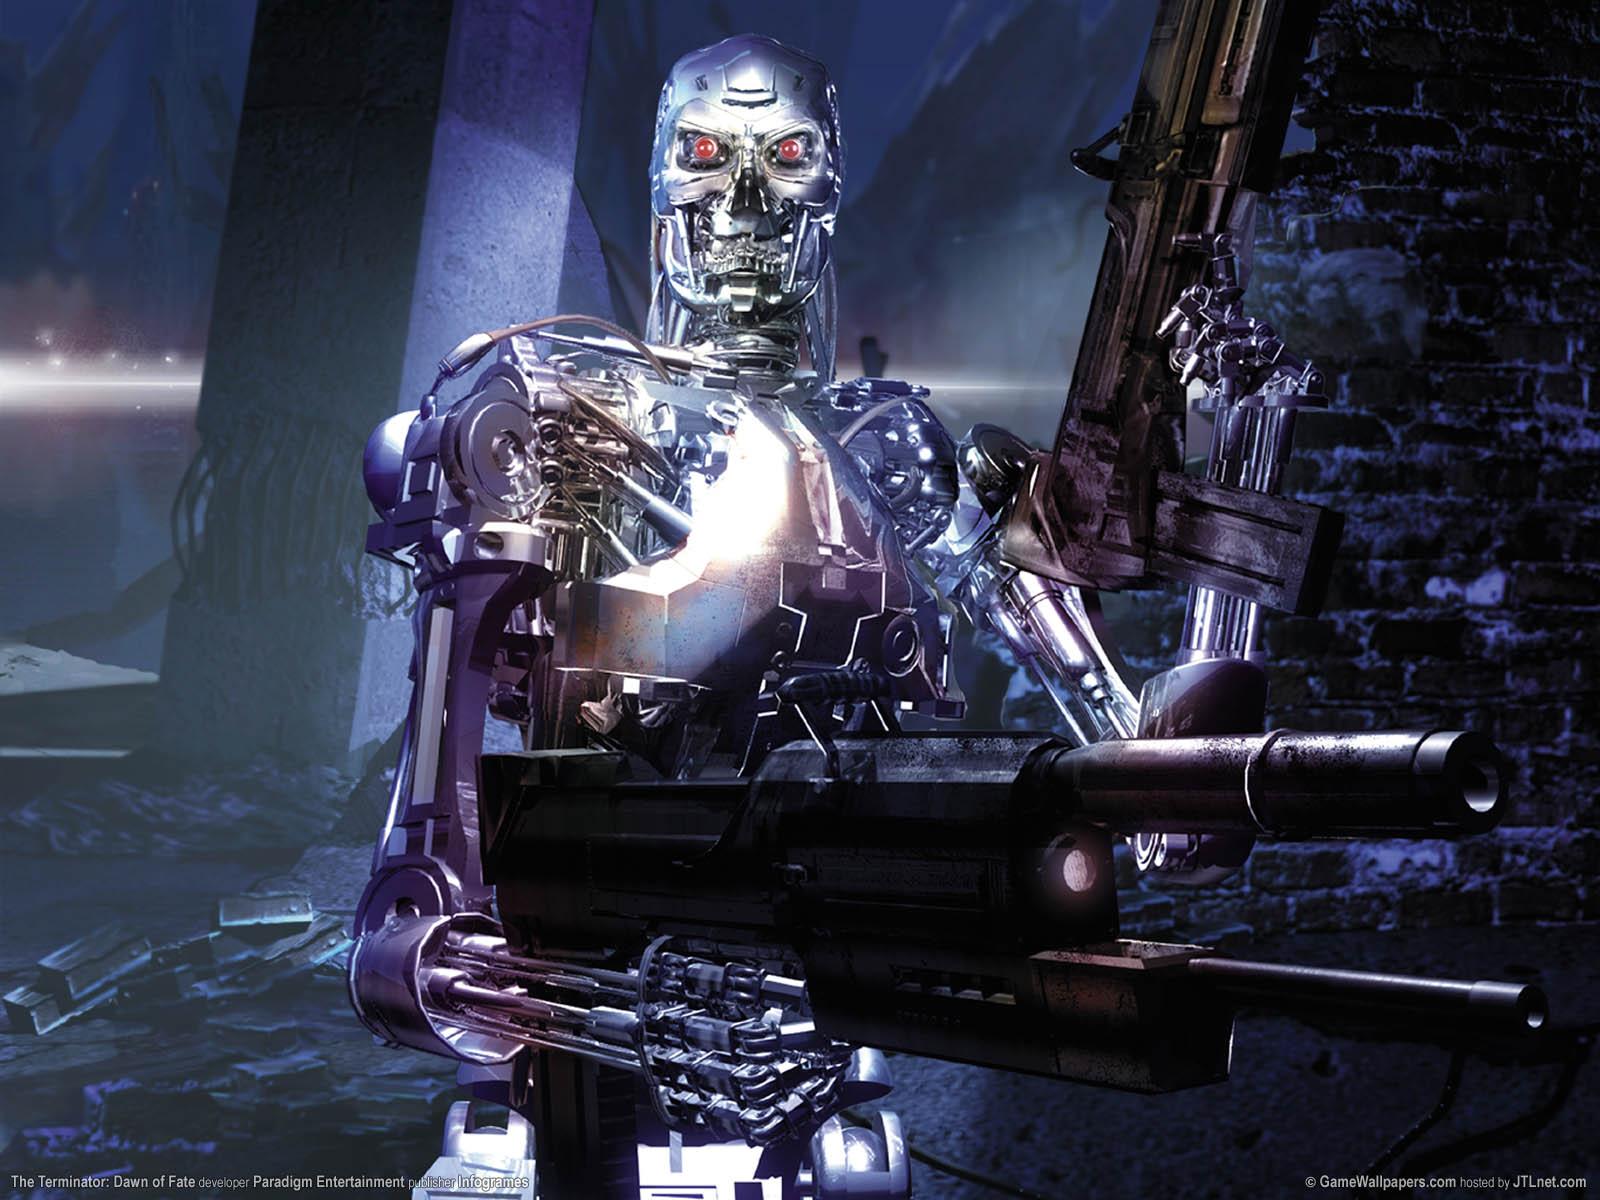 The Terminator: Dawn of Fate Hintergrundbild 01 1600x1200